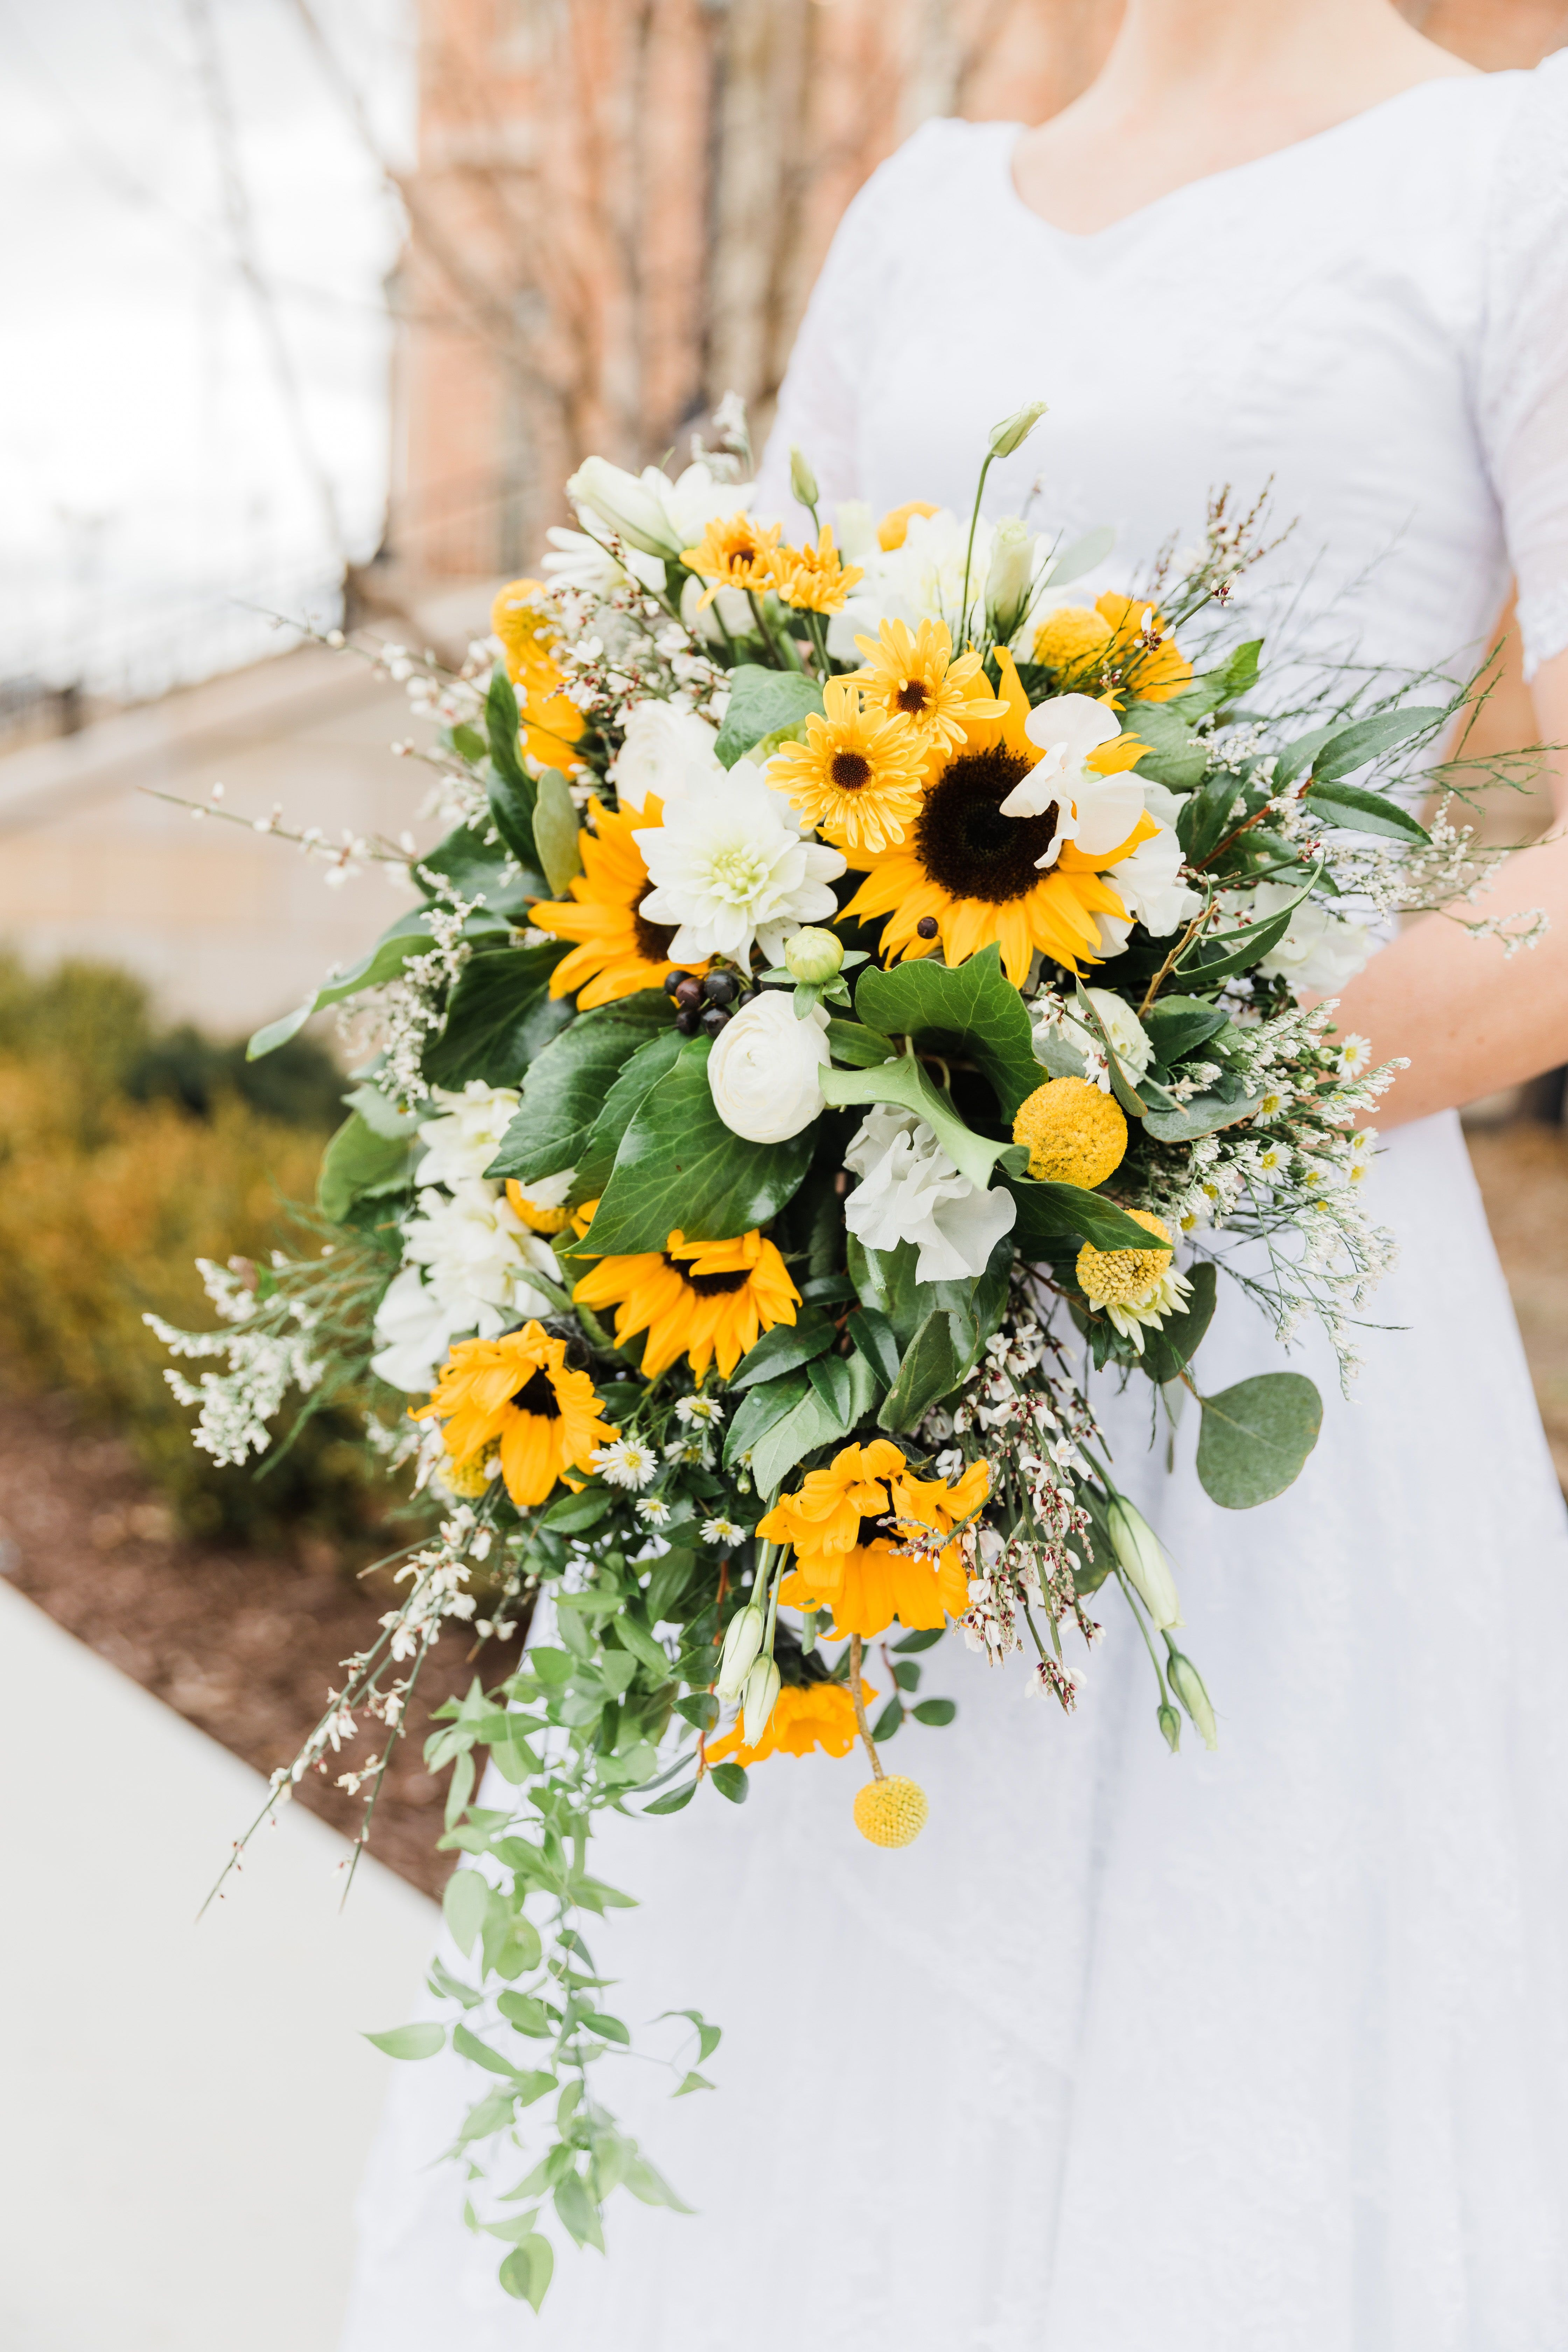 Wadley Farms Spring Wedding Full Of Sunflowers Lindon Utah Sunflower Wedding Bouquet Sunflower Bridal Bouquet Sunflower Wedding Decorations